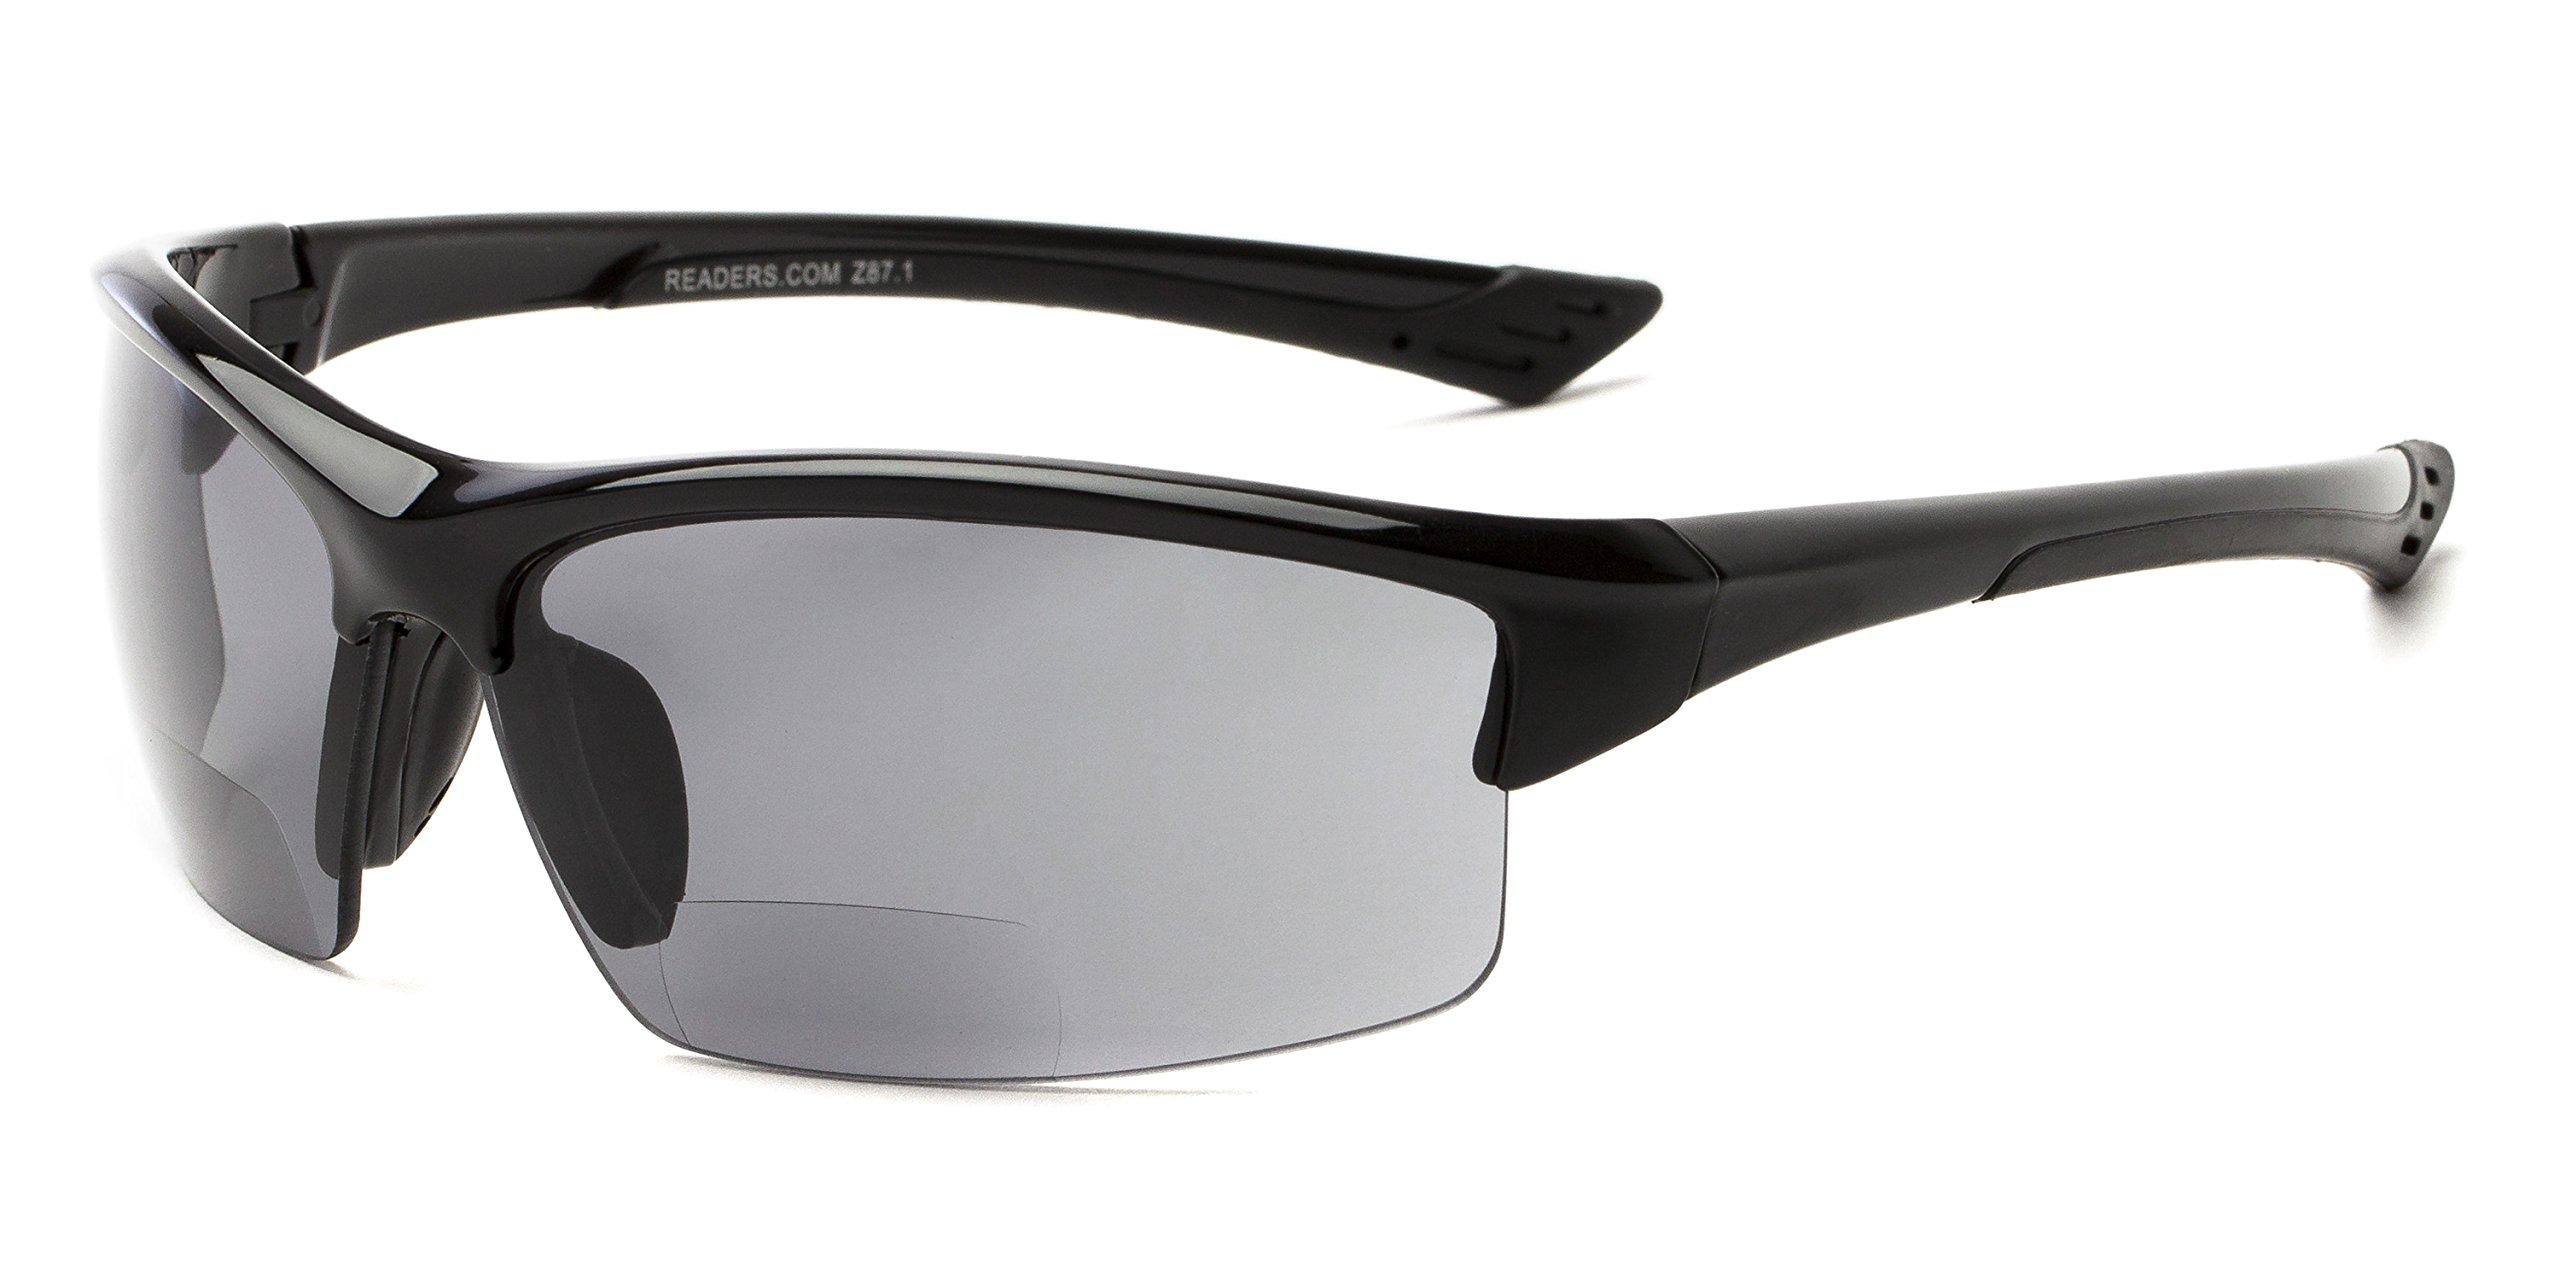 Readers.com   The Foster Bifocal Sun Reader - Sport & Wrap-Around Reading Sunglasses